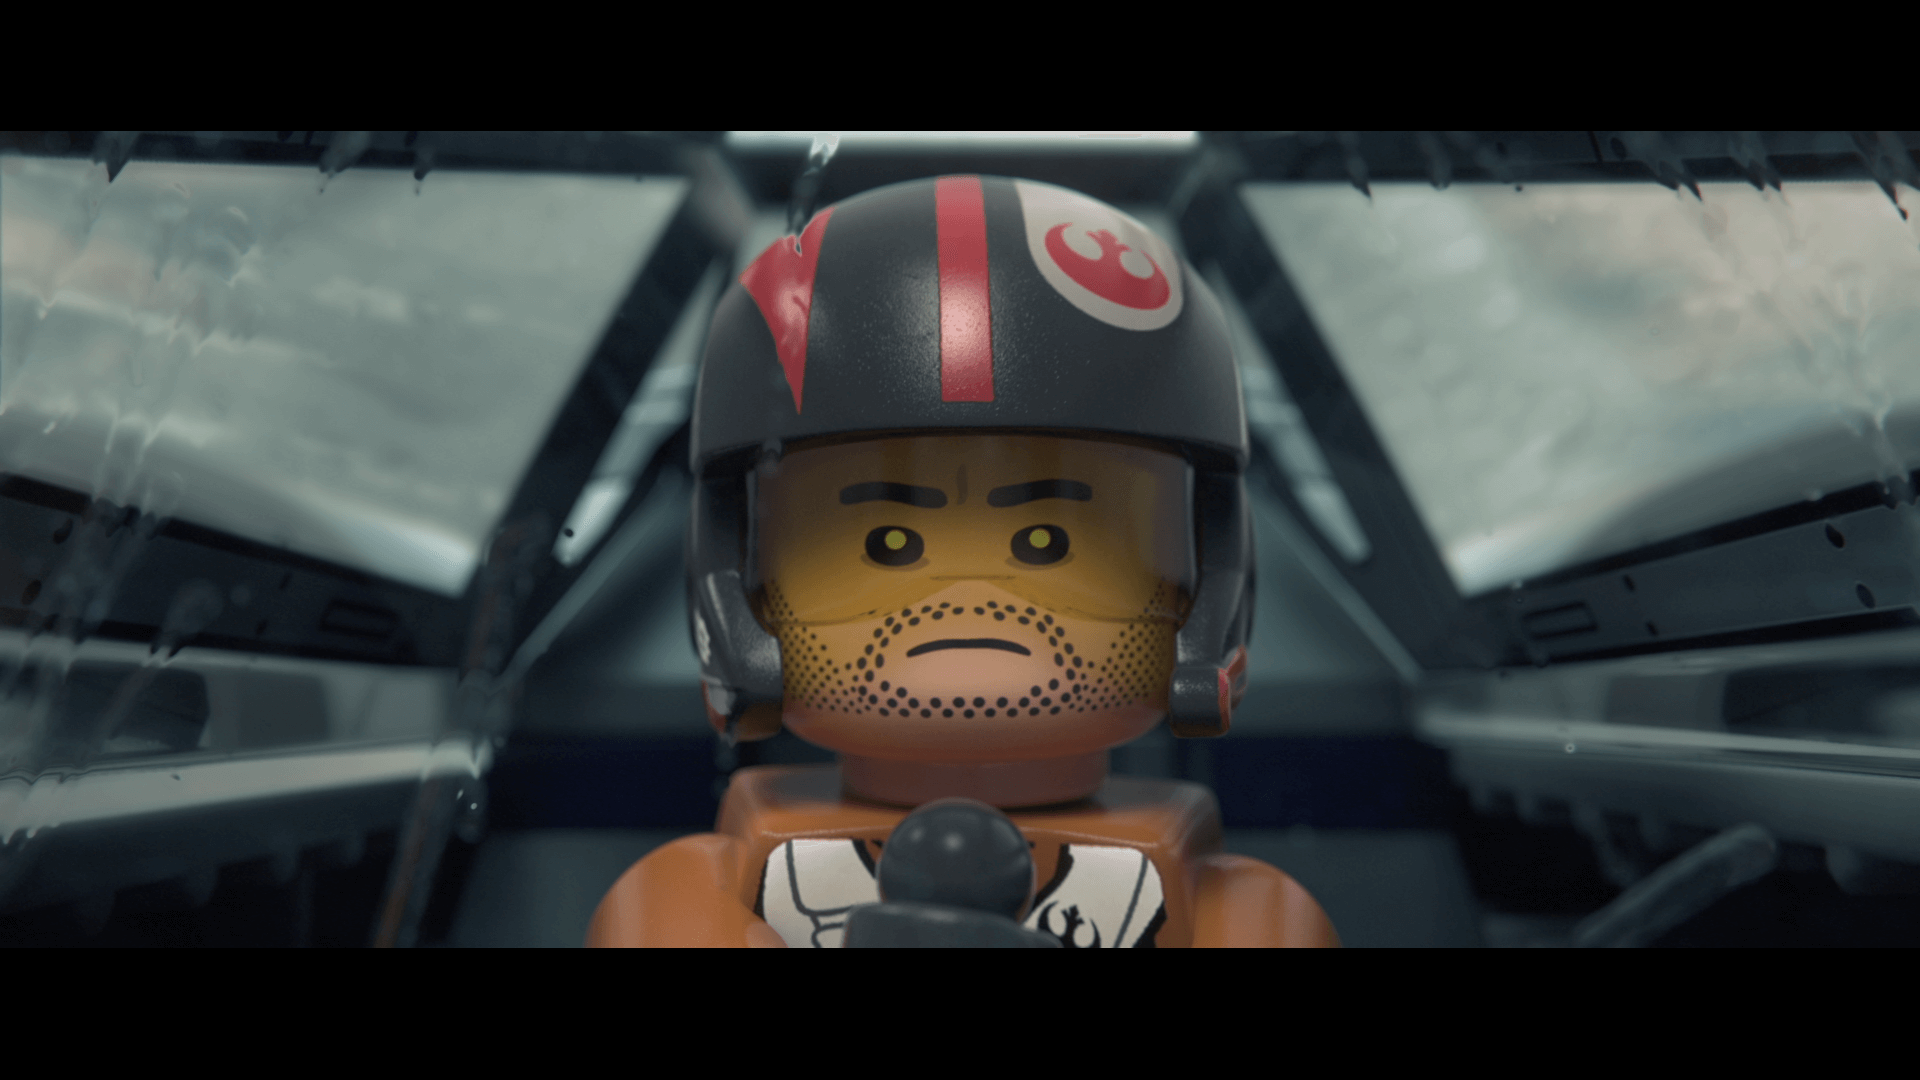 Lego Star Wars: The Force Awakens: Poe Dameron, zweitbester Raumpilot (Bildrechte: Feral Interactive)